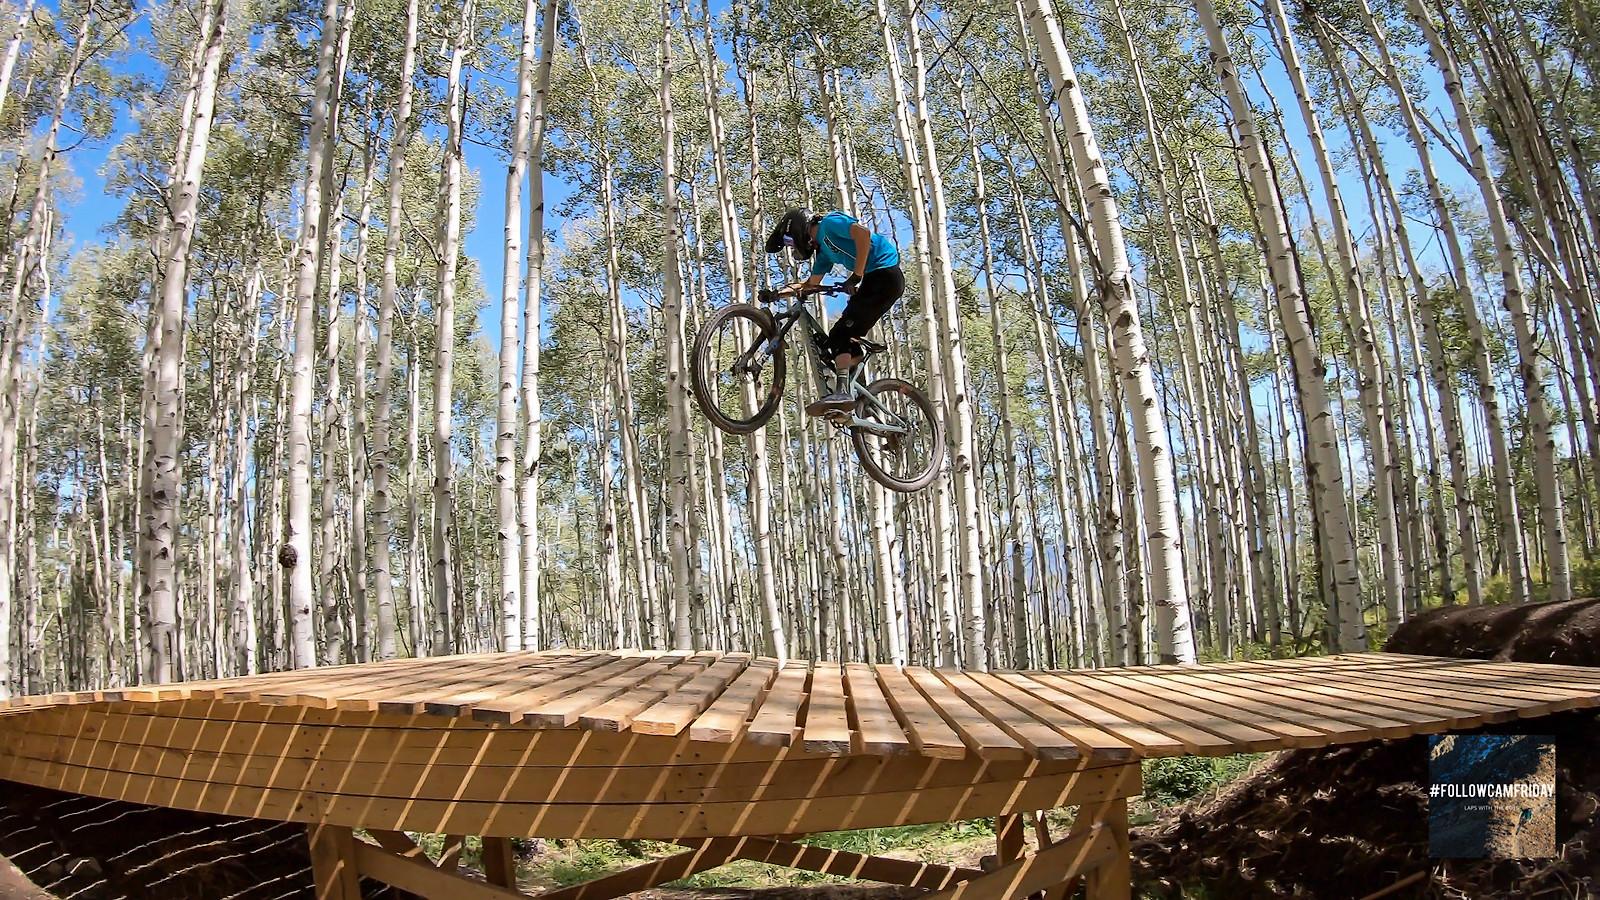 Flying through the Aspens - FlowyMcFlowerton - Mountain Biking Pictures - Vital MTB